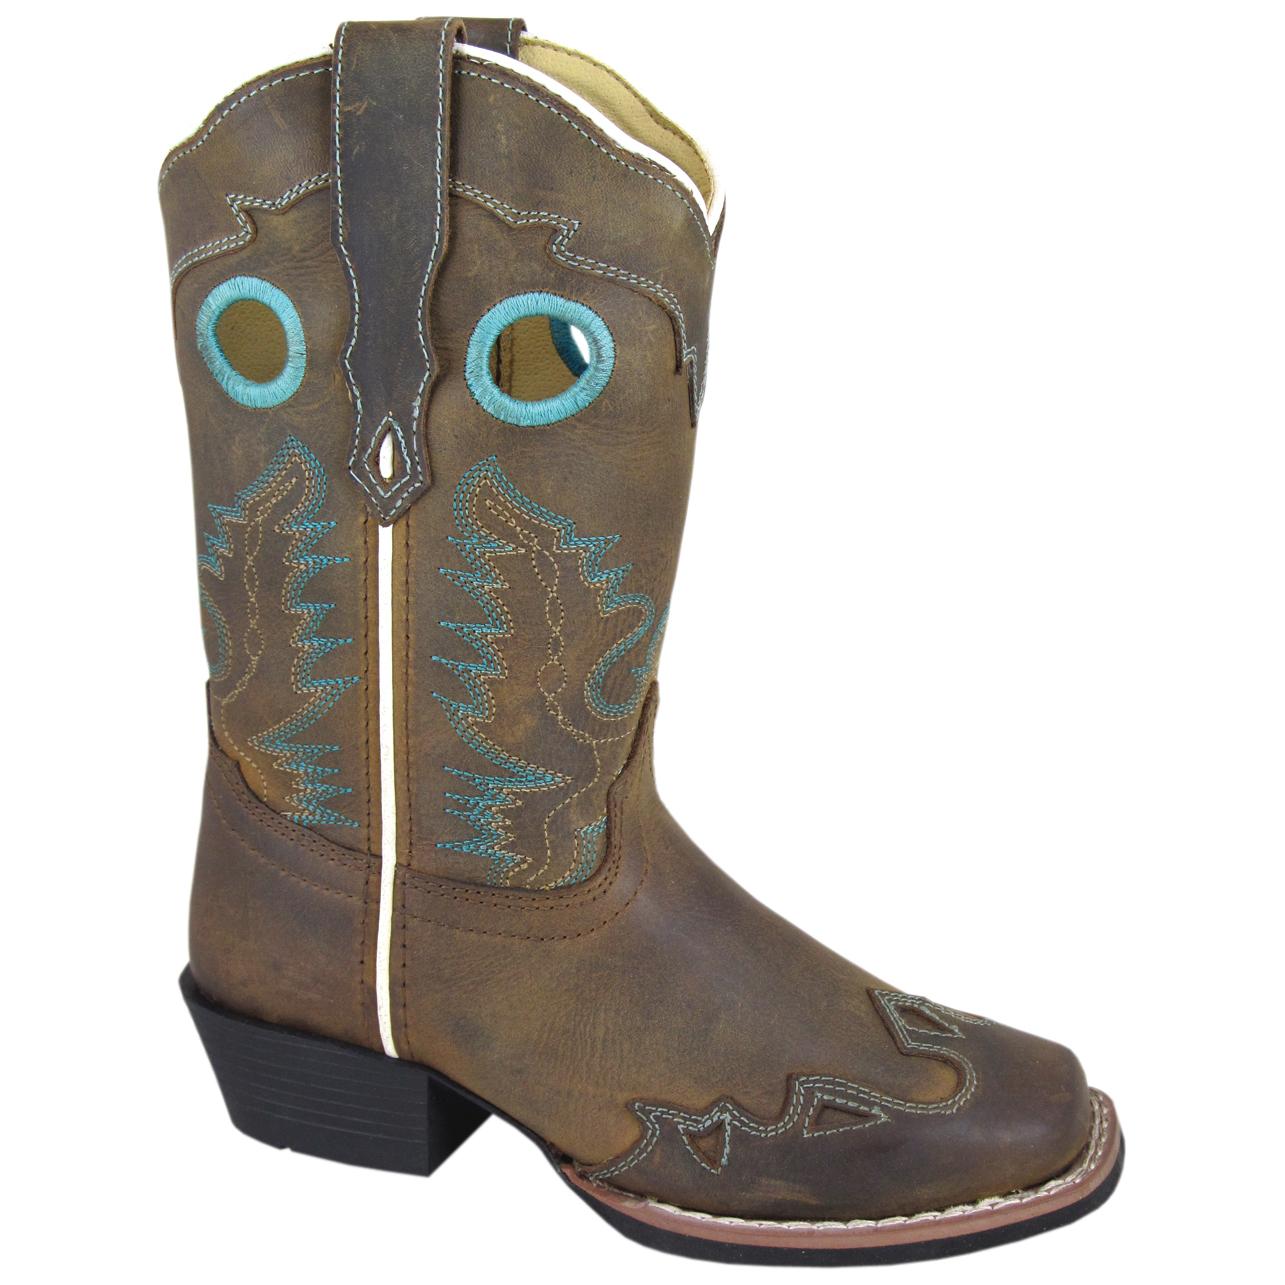 Smoky Mountain Boots Kid's El Dorado Brown Distress Leather Cowboy Boot PartNumber: 3ZZVA93069612P MfgPartNumber: 3344C